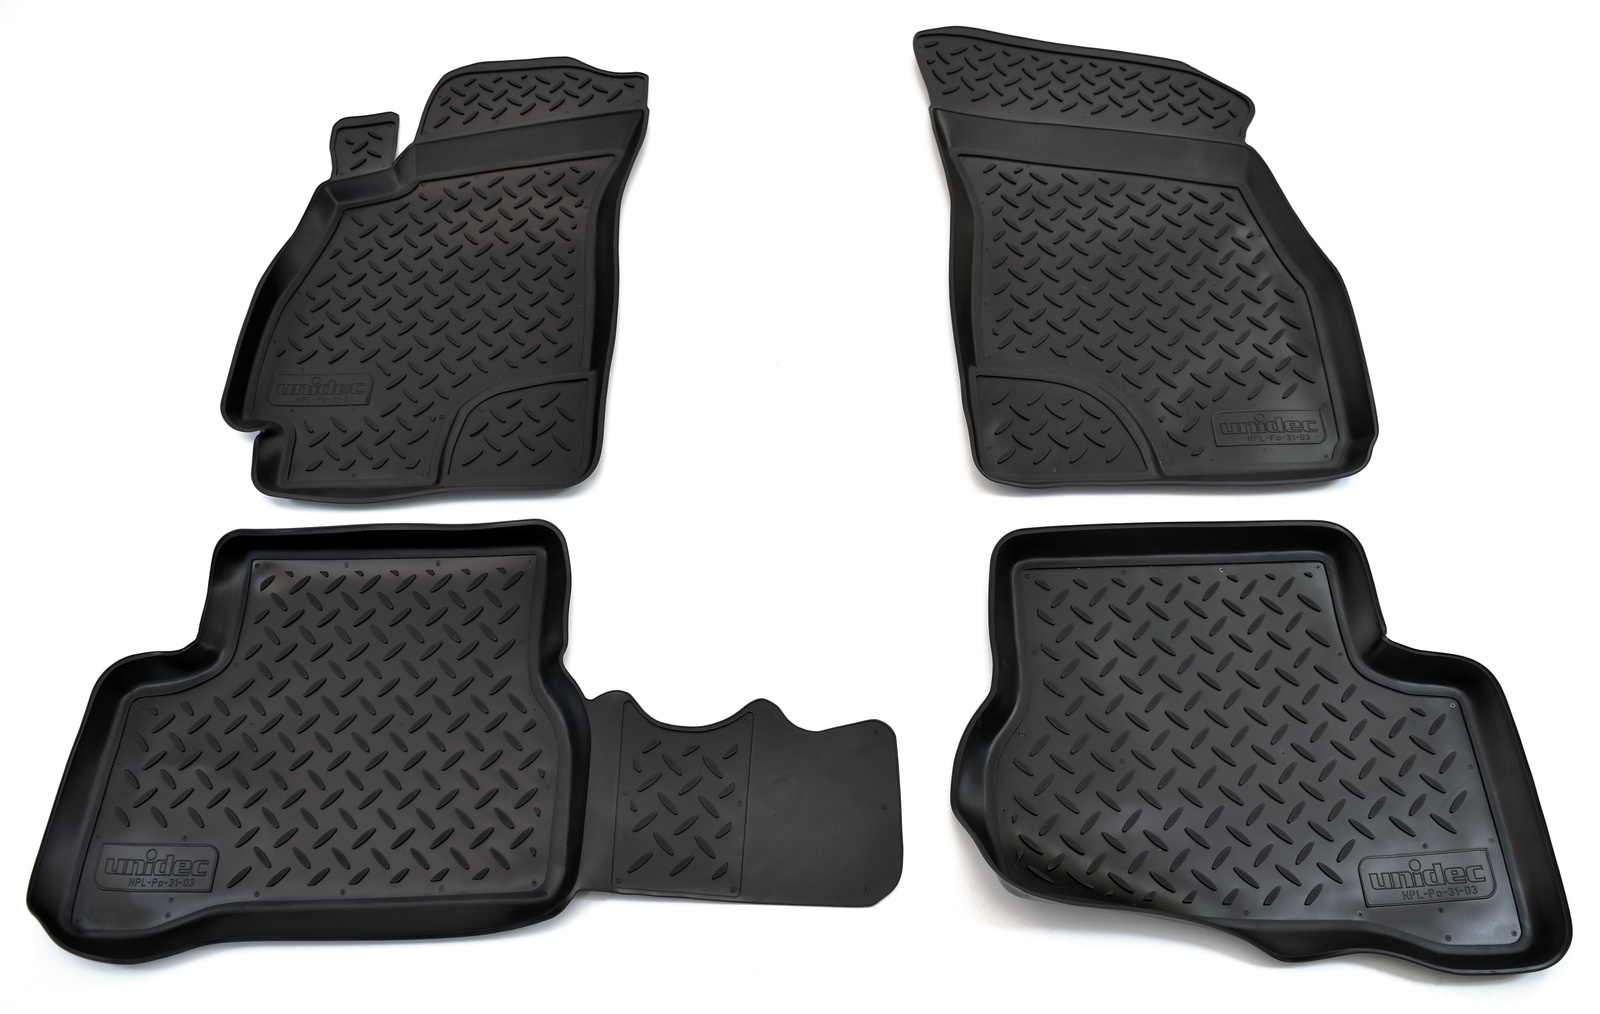 Коврики в салон Norplast для Hyundai Accent LC 2000, NPL-Po-31-03, черный цены онлайн